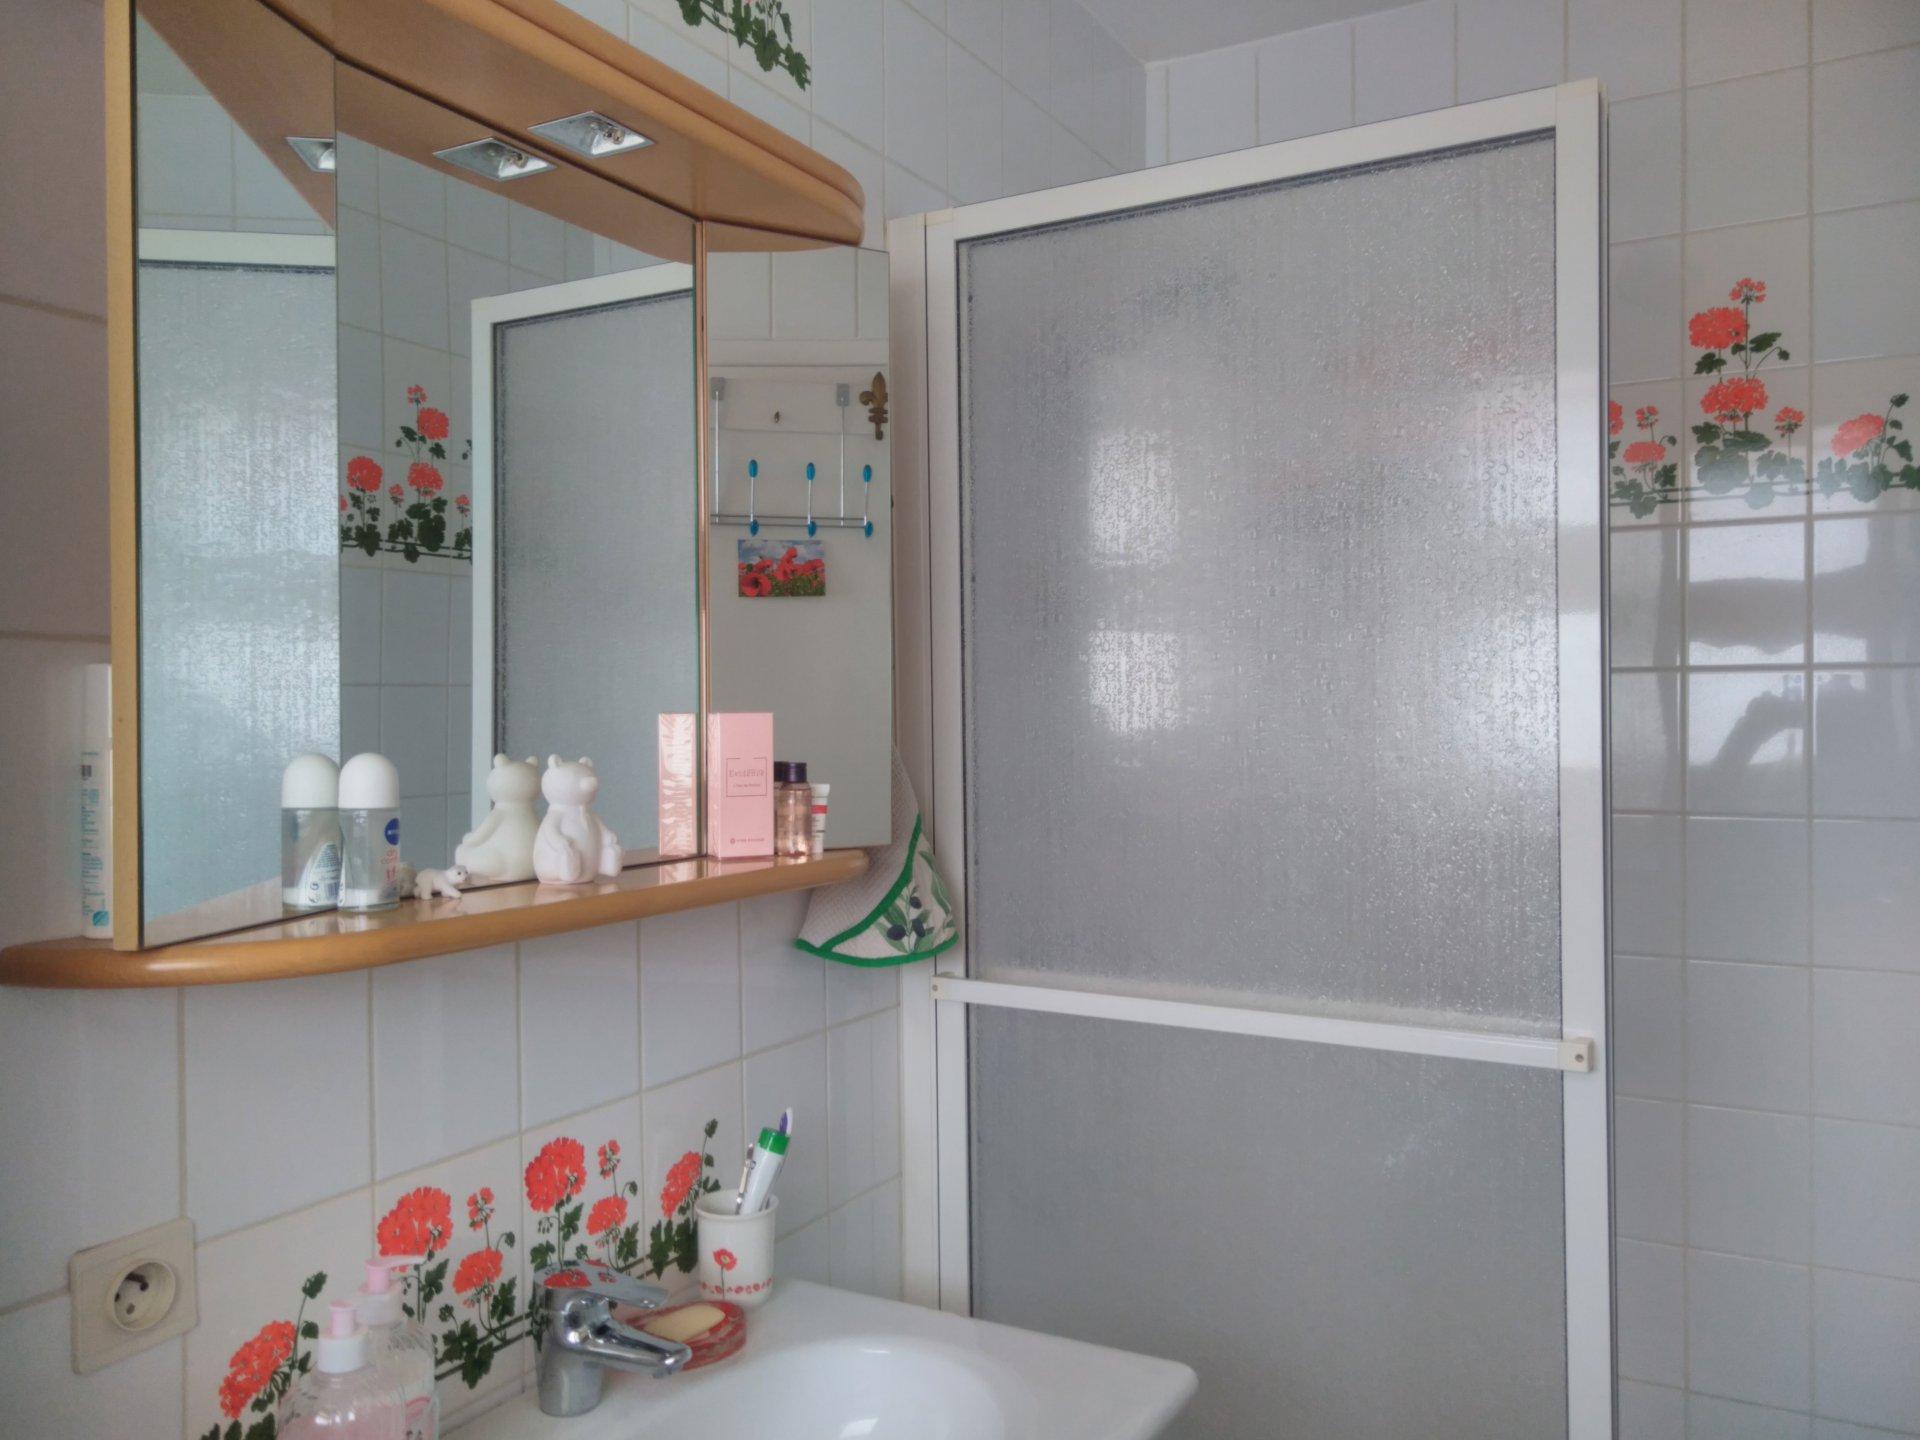 5792CSA - Appt env 105 m² - Vue dégagée - Vichy